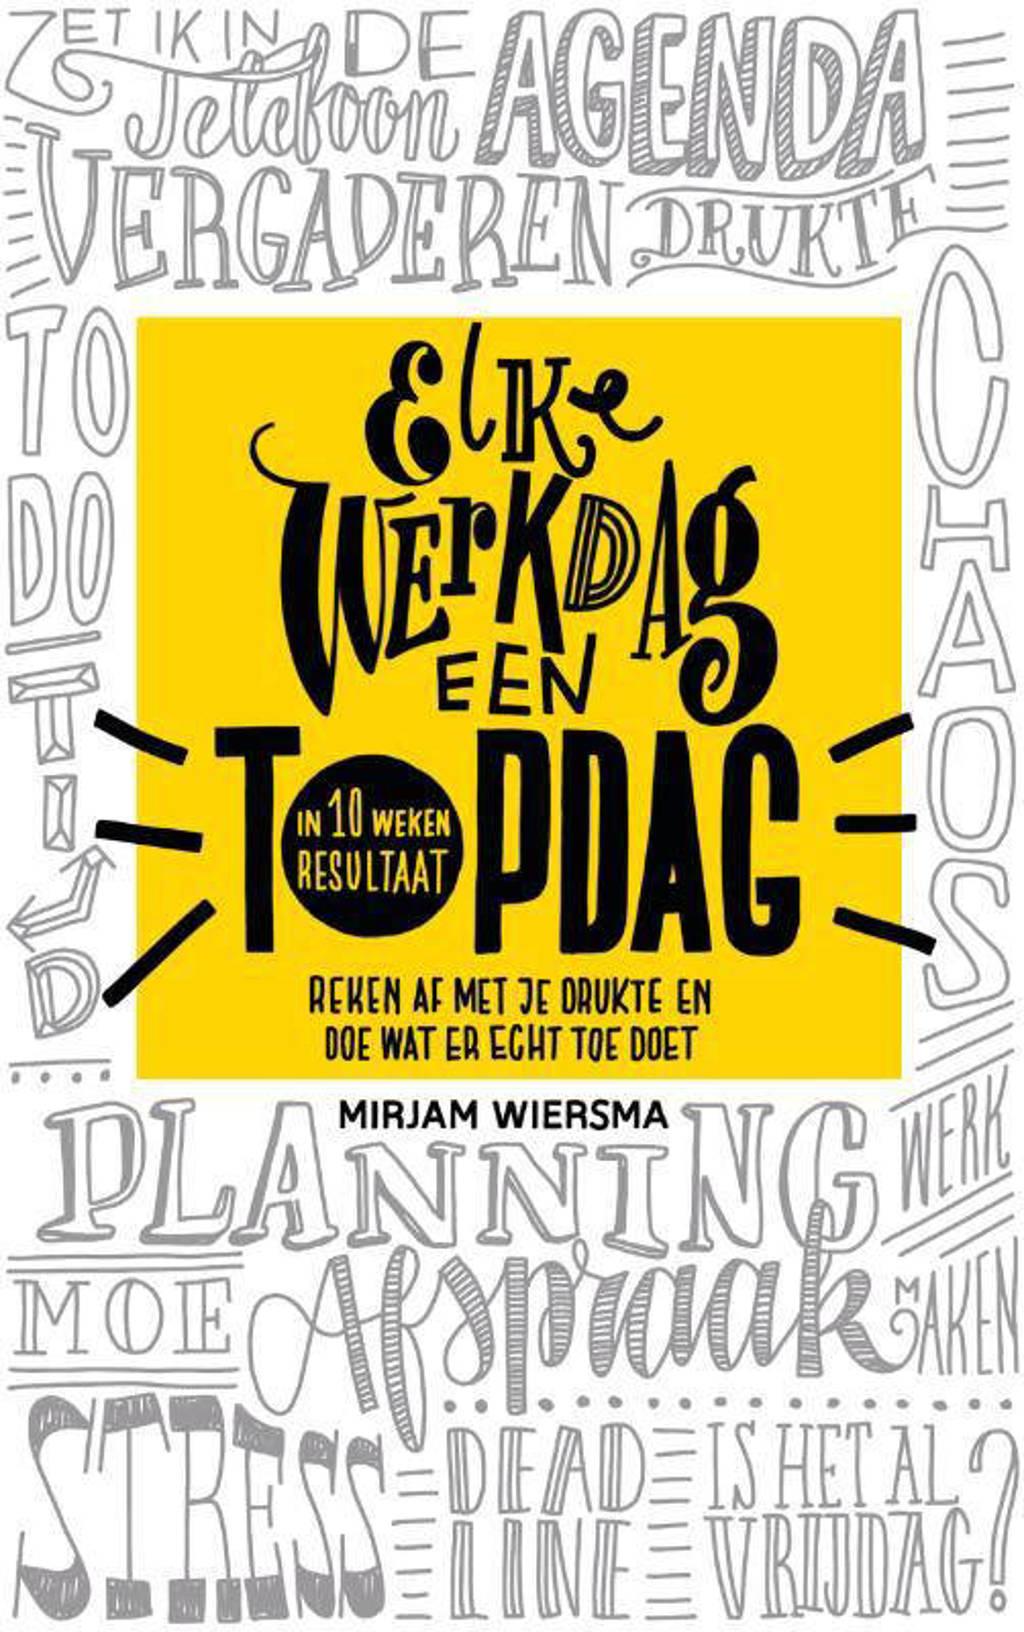 Elke werkdag een topdag - Mirjam Wiersma